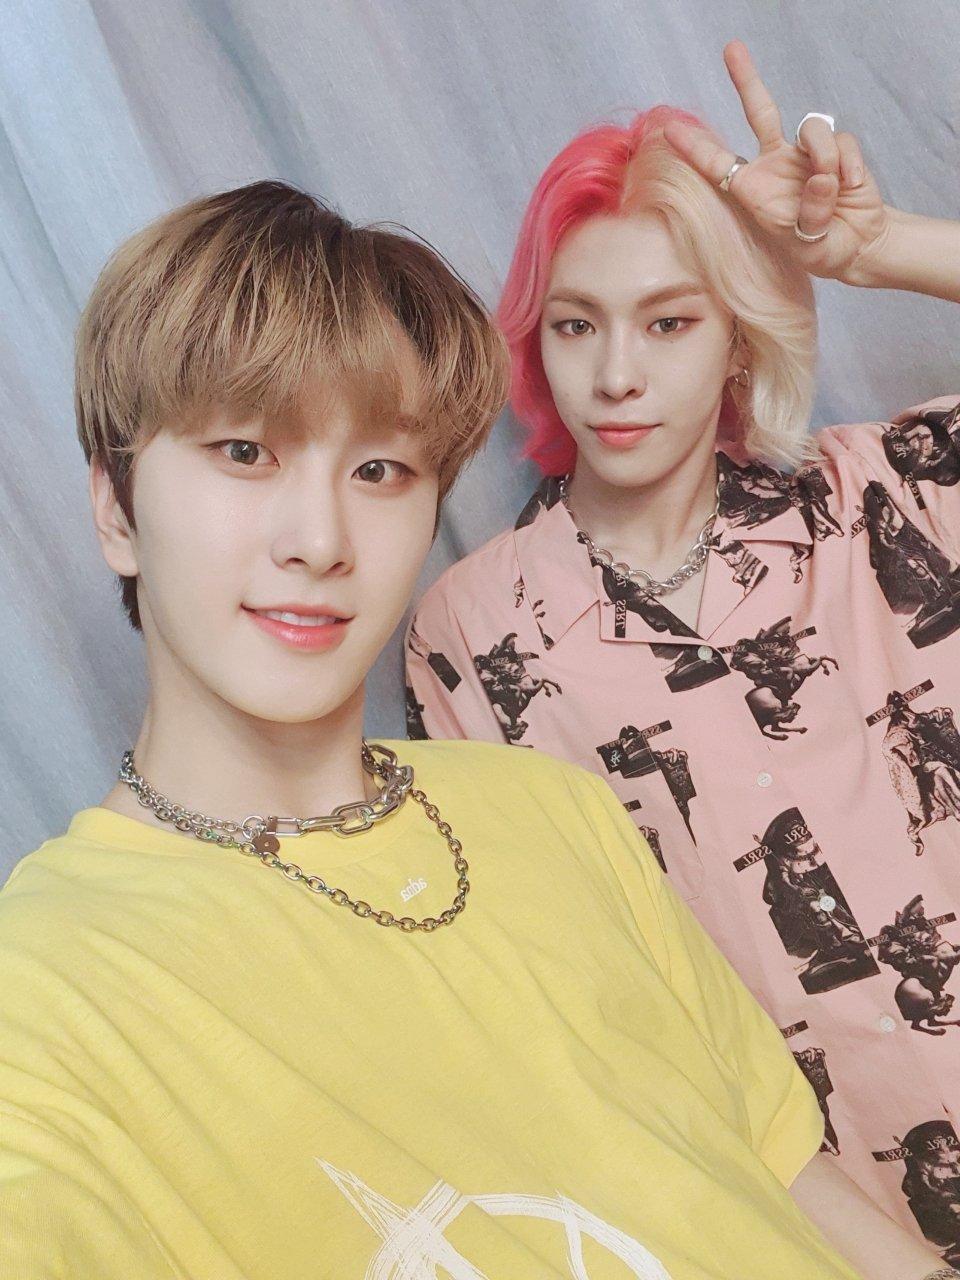 newkidd jinkwon hwi